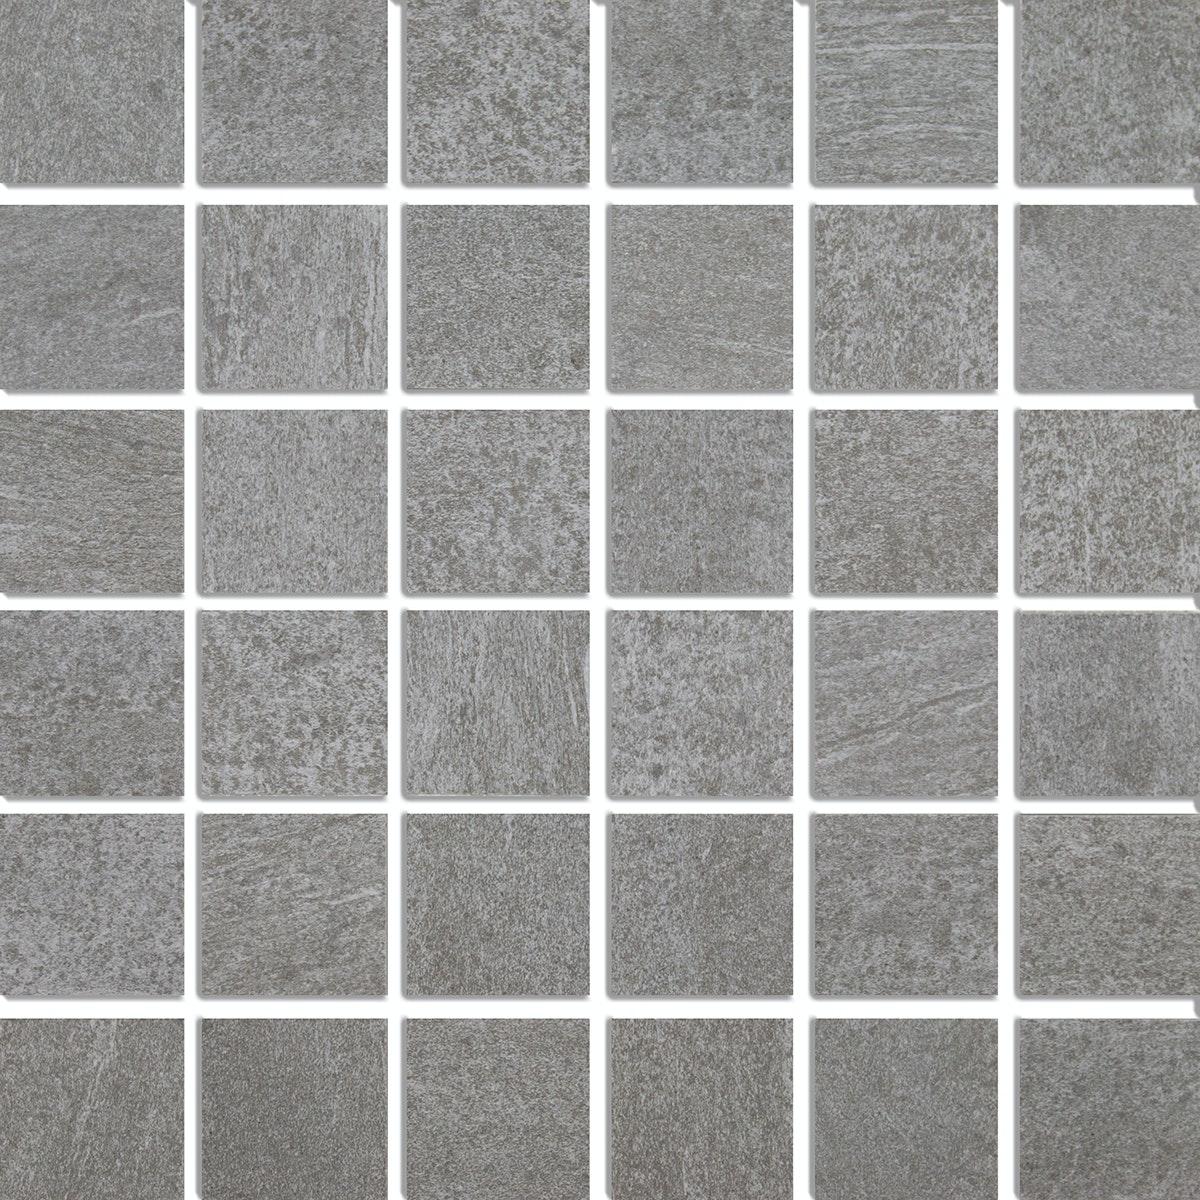 V.360 Black Mosaico